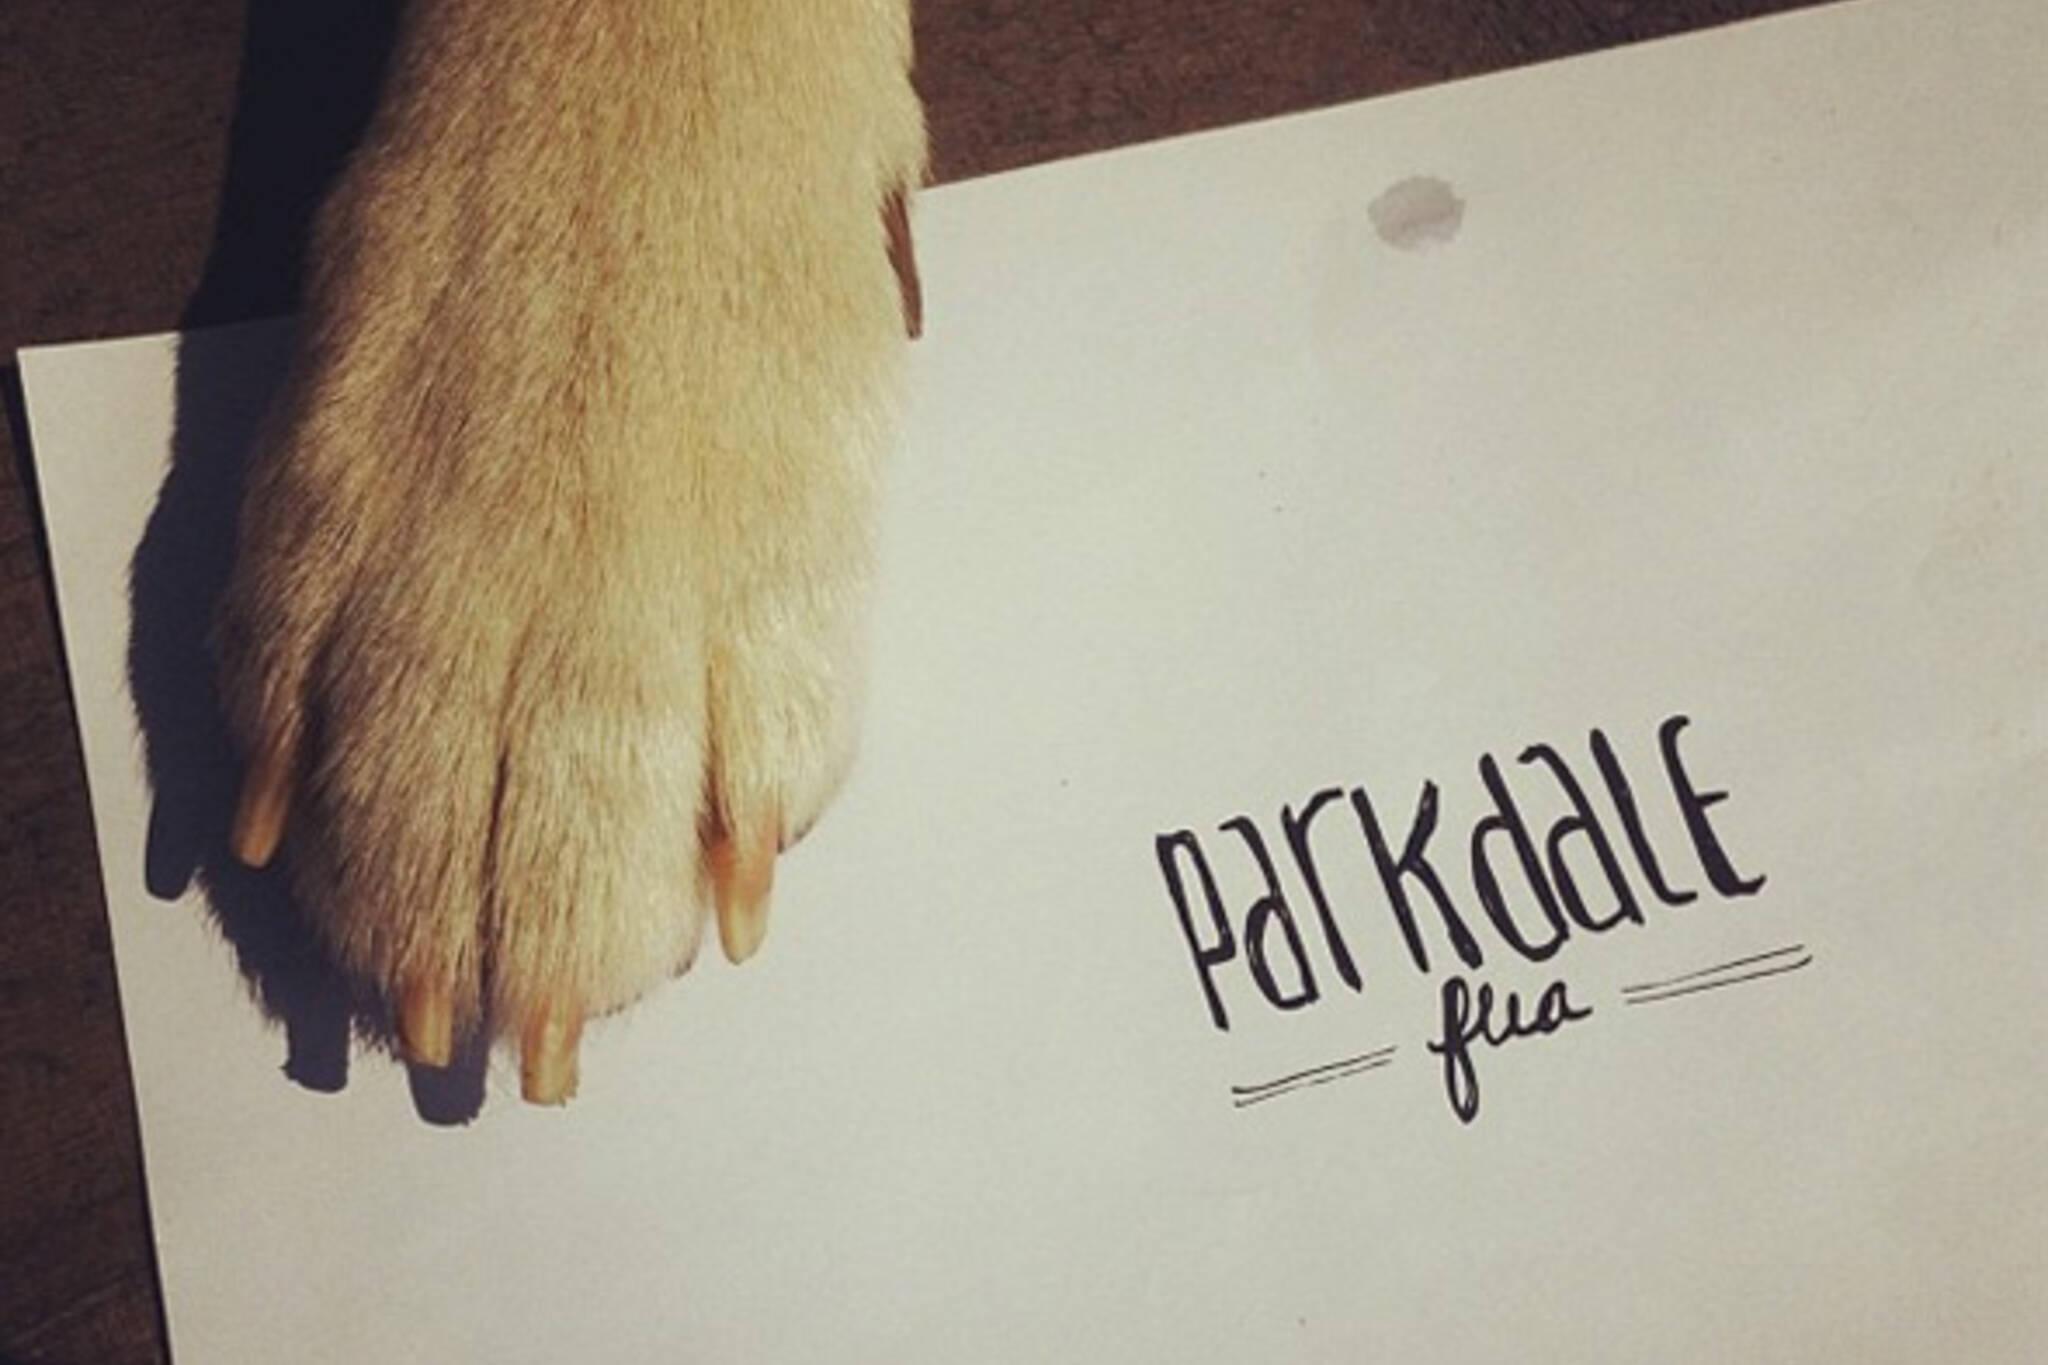 Parkdale Flea